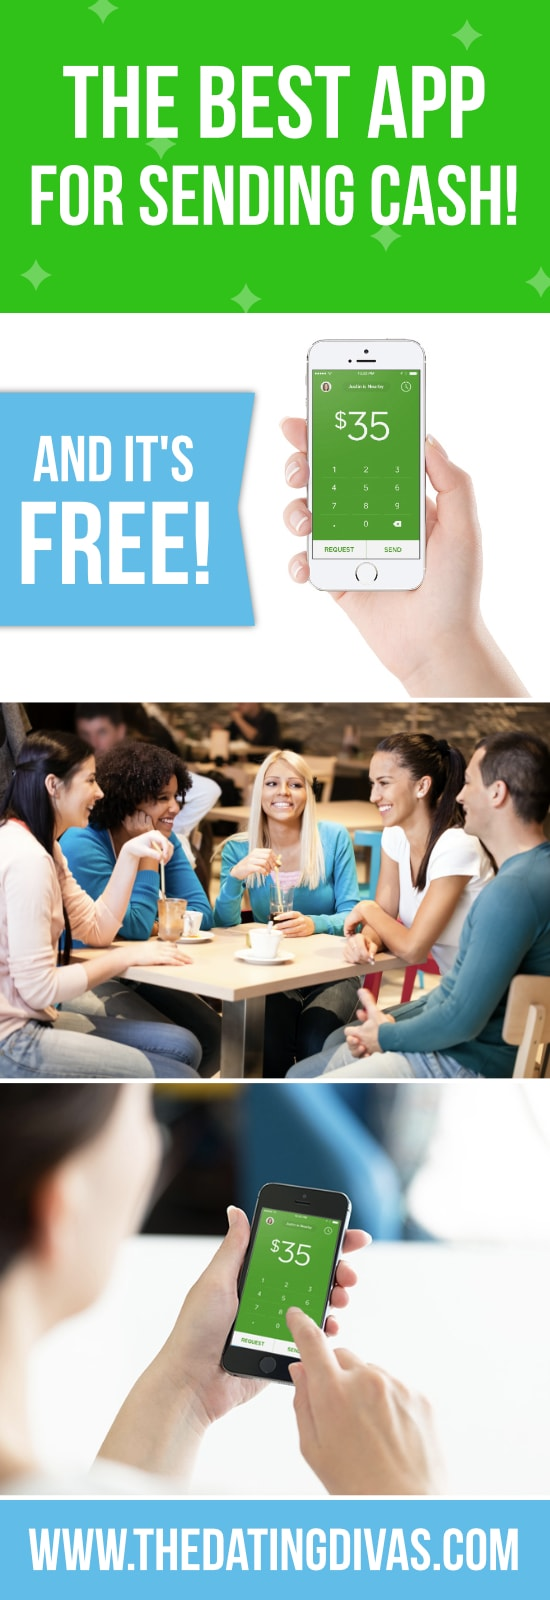 The Square Cash App